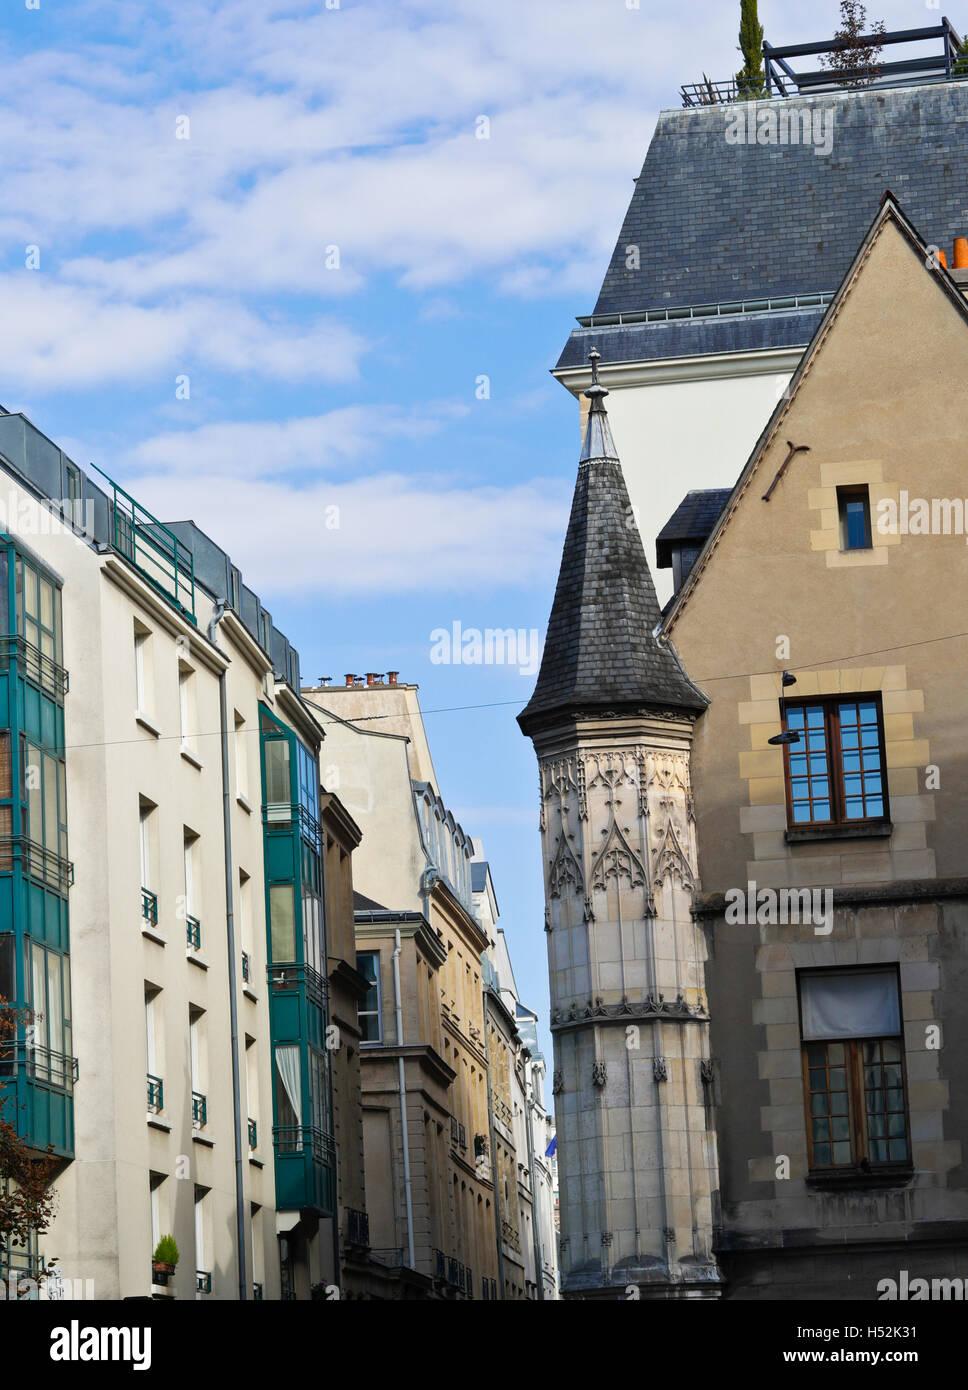 Parisian architecture in the Marais, Paris, France - Stock Image